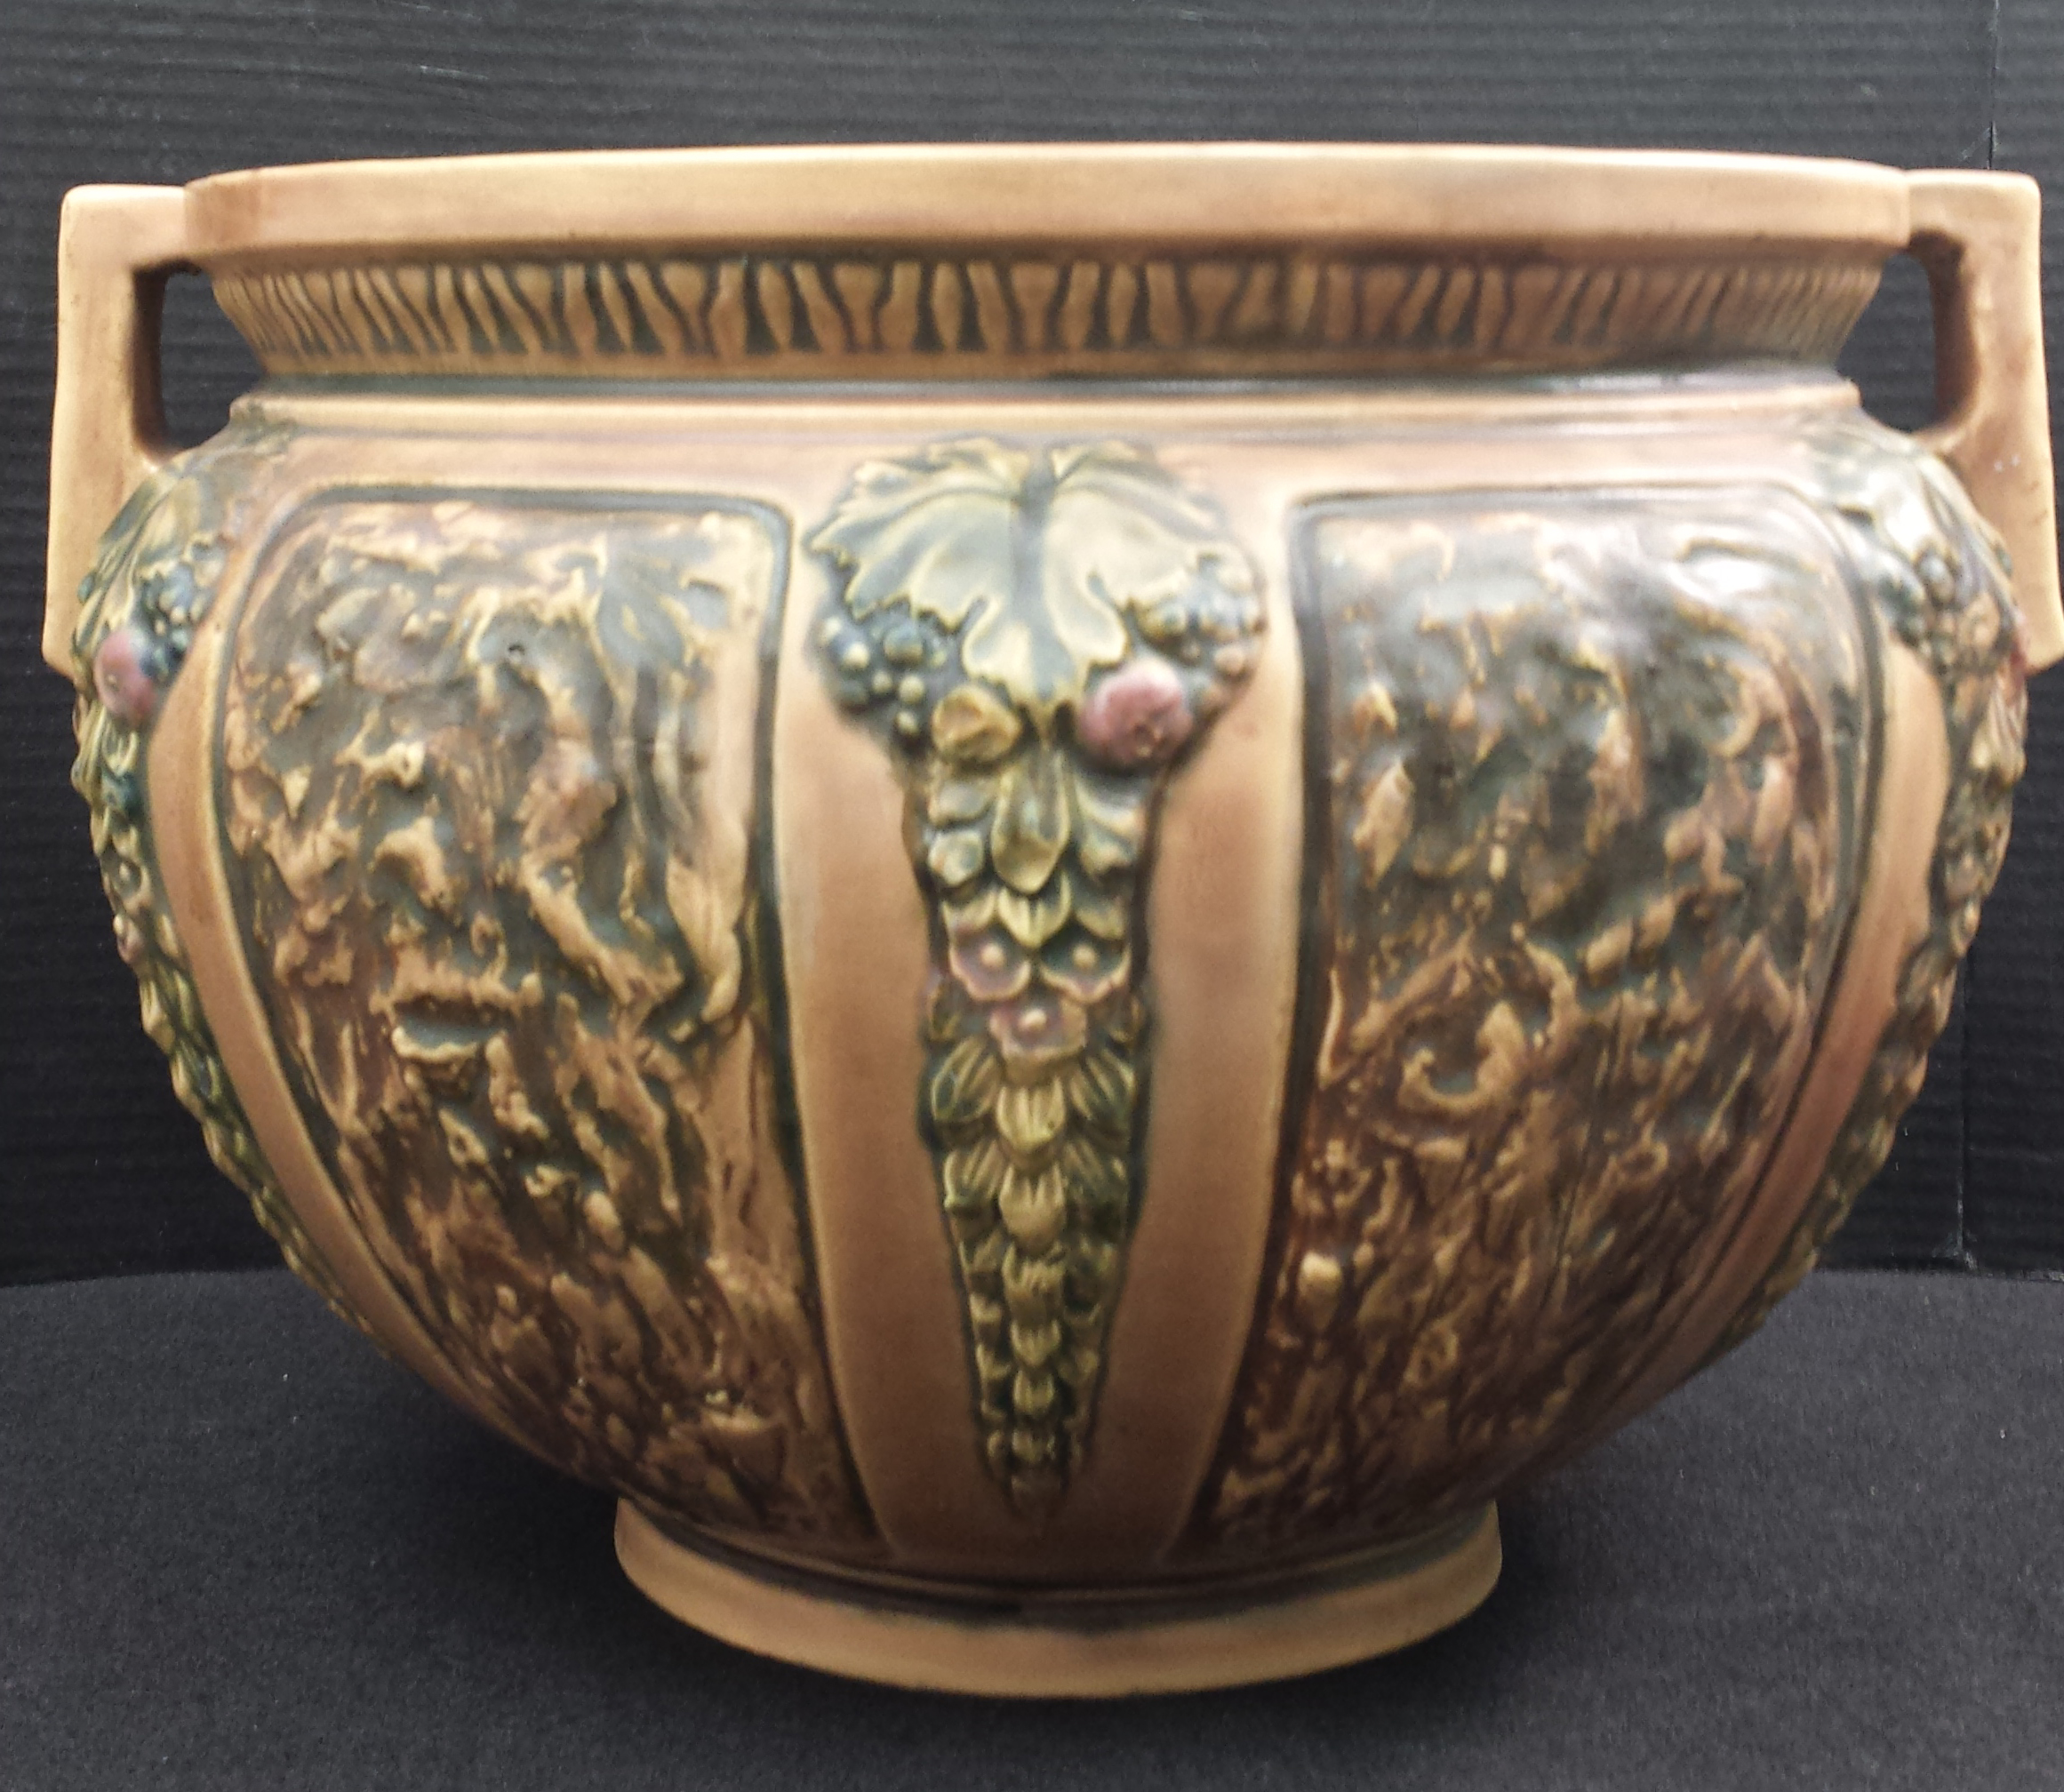 Porcelain B-A 3-02